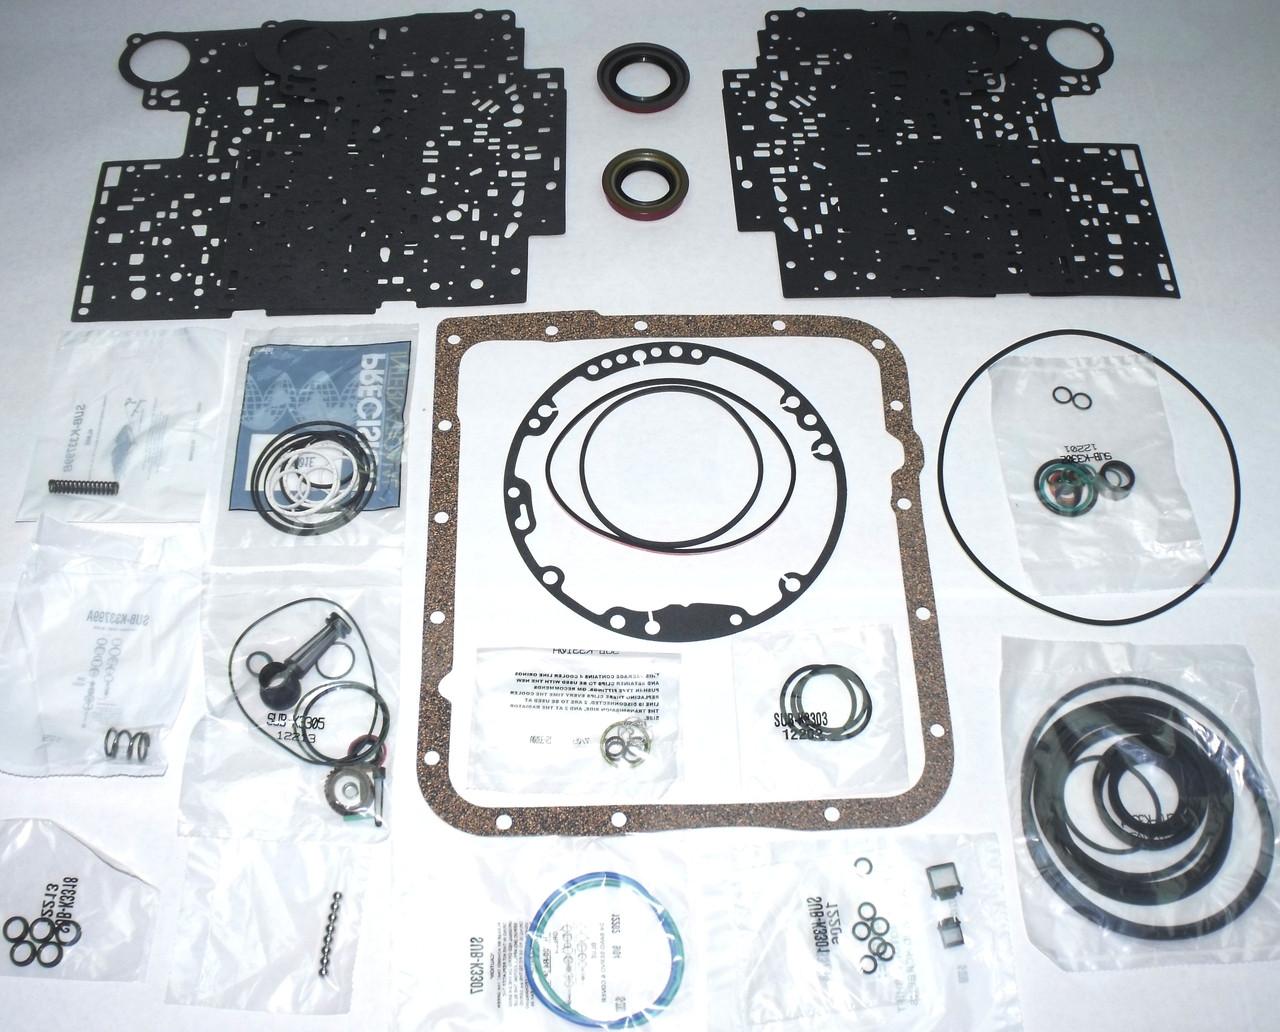 GM TAAT Transmission Molded Rubber Piston KitOE# K95941Fast Shipping!